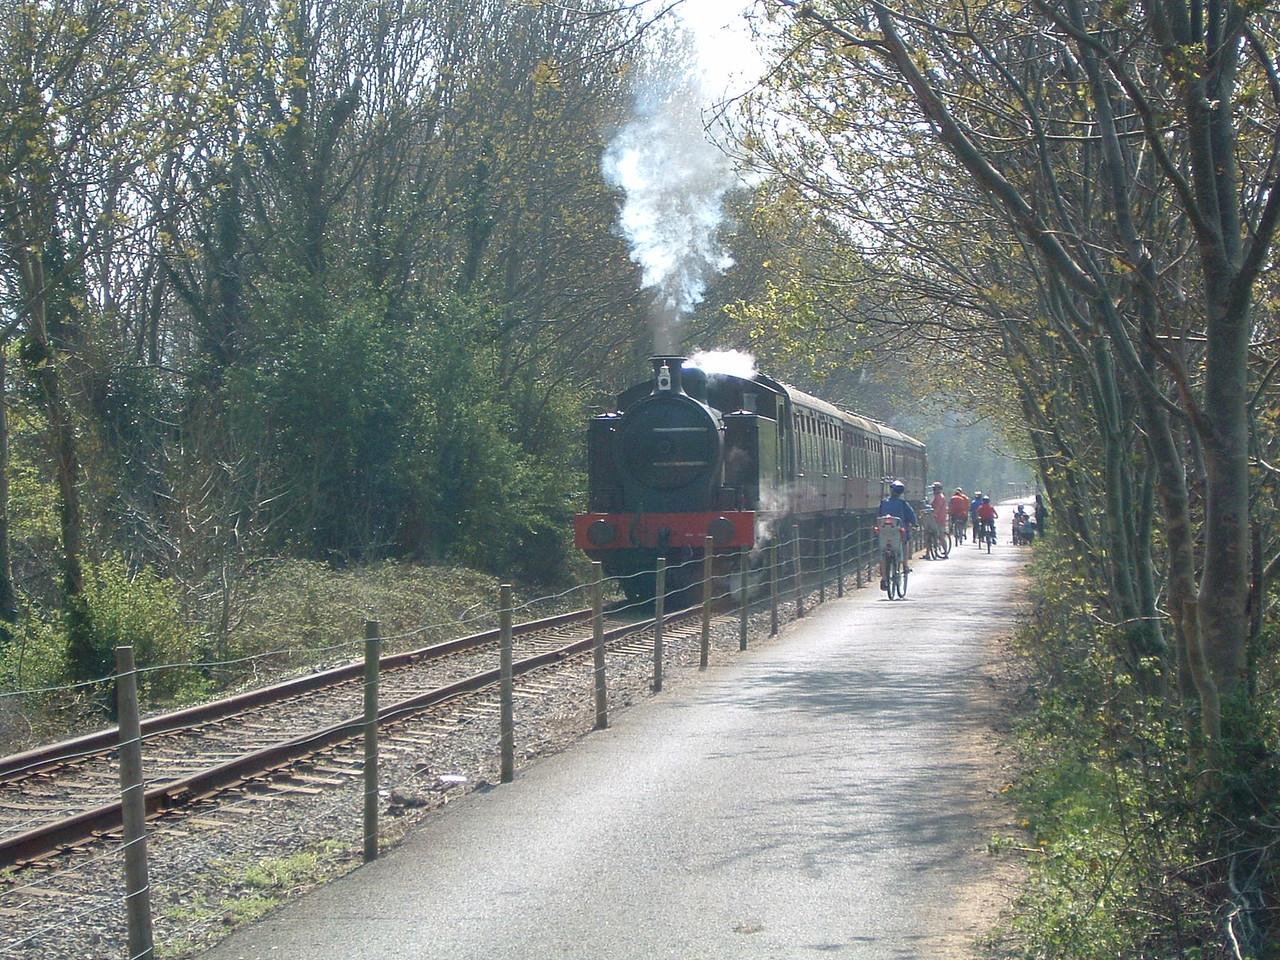 Avon Valley Railway